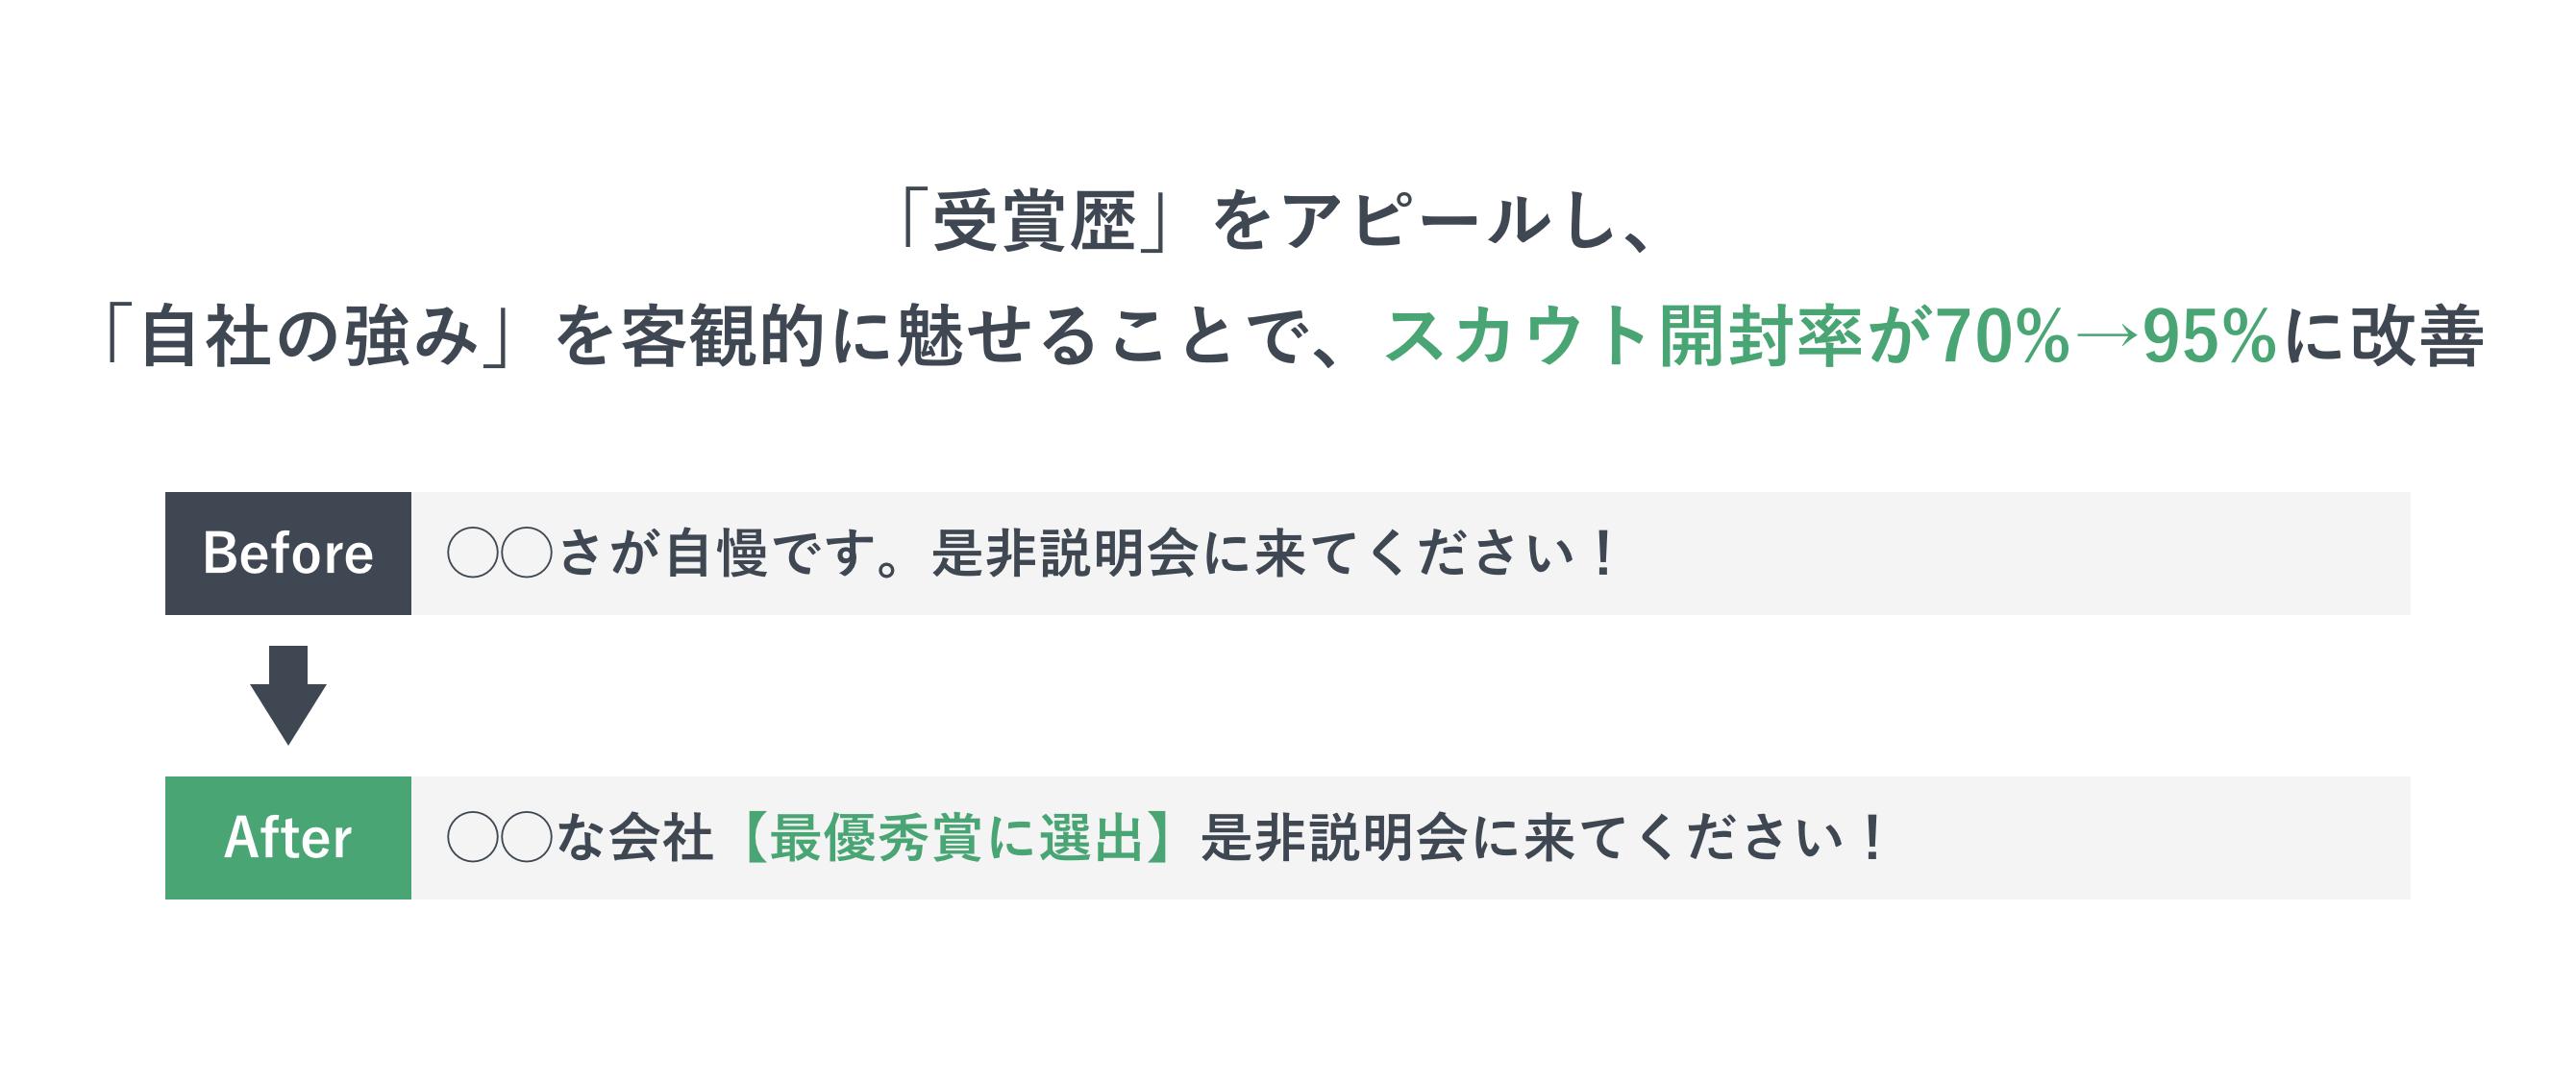 contents_award-2